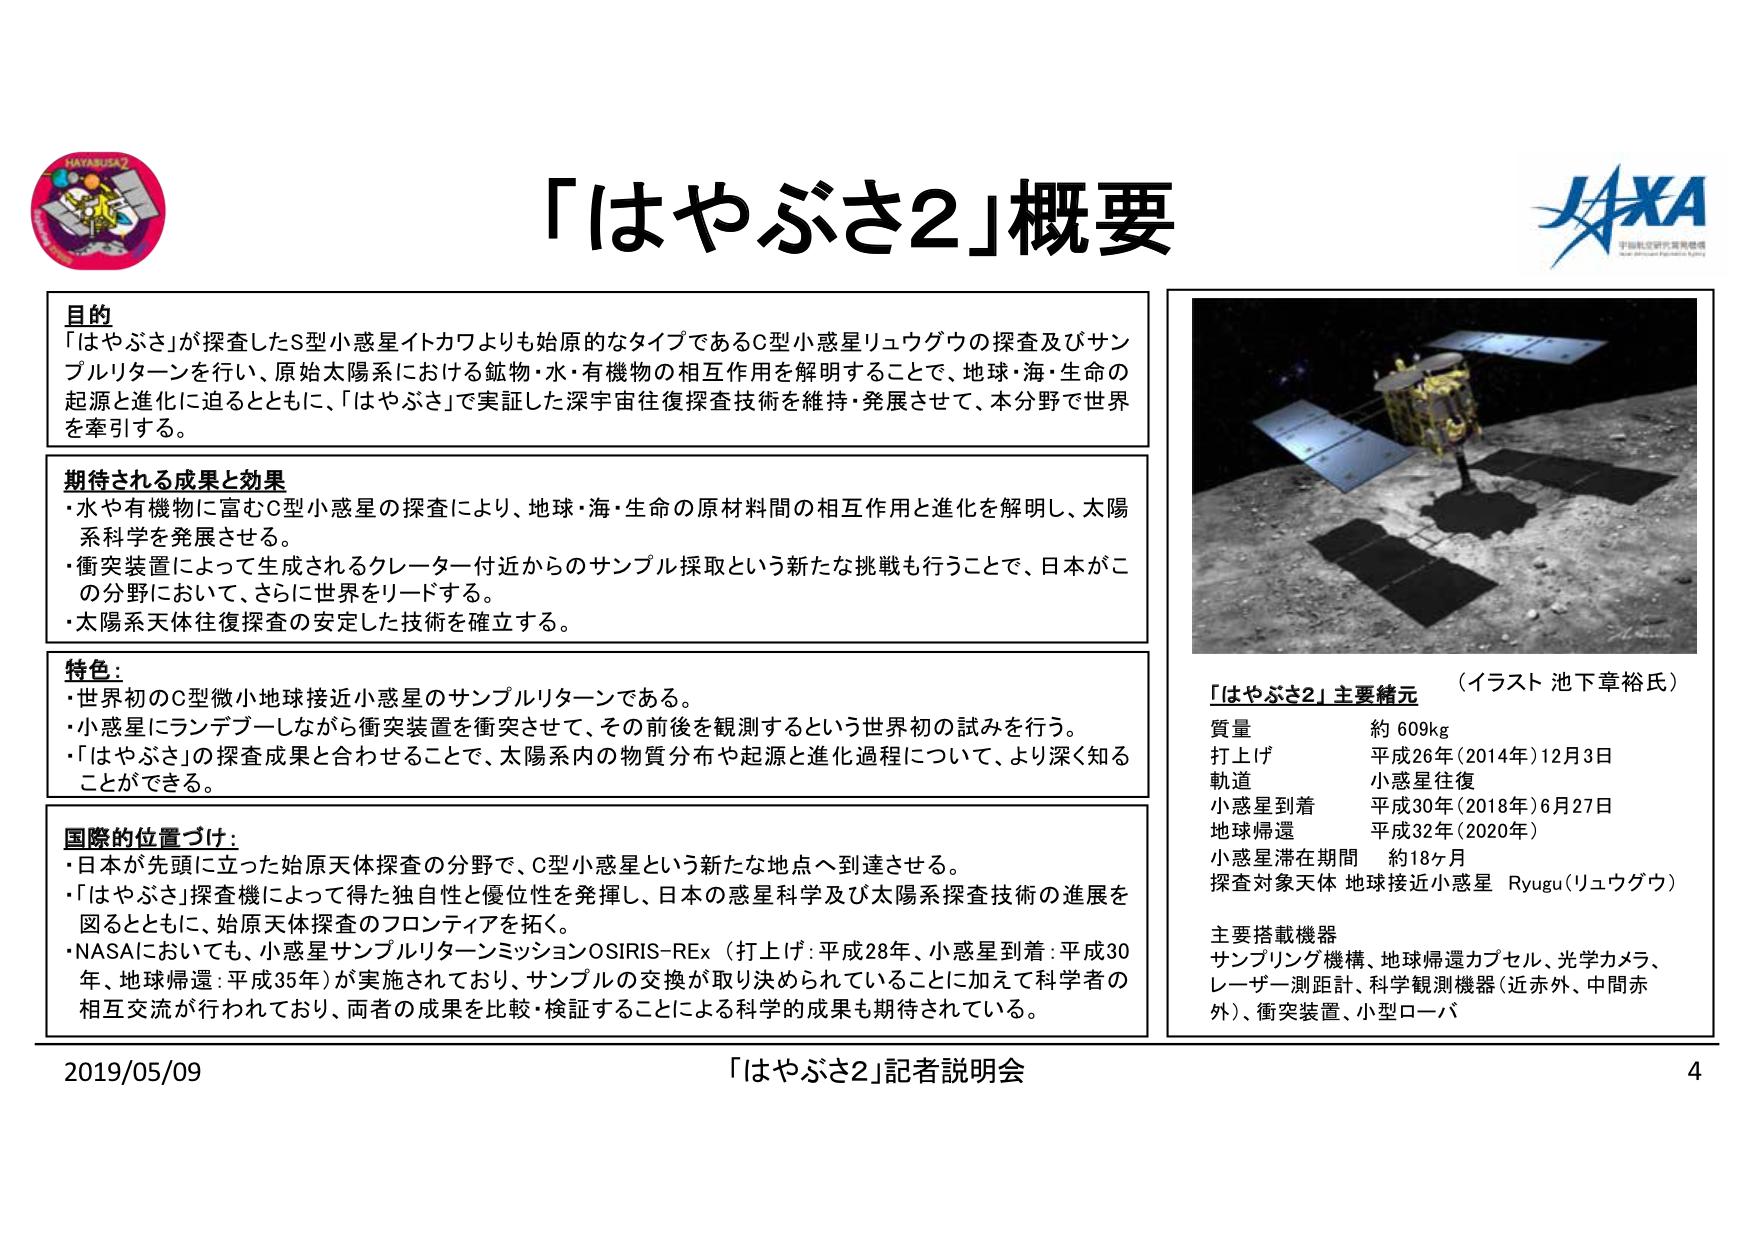 f:id:Imamura:20190509154400p:plain